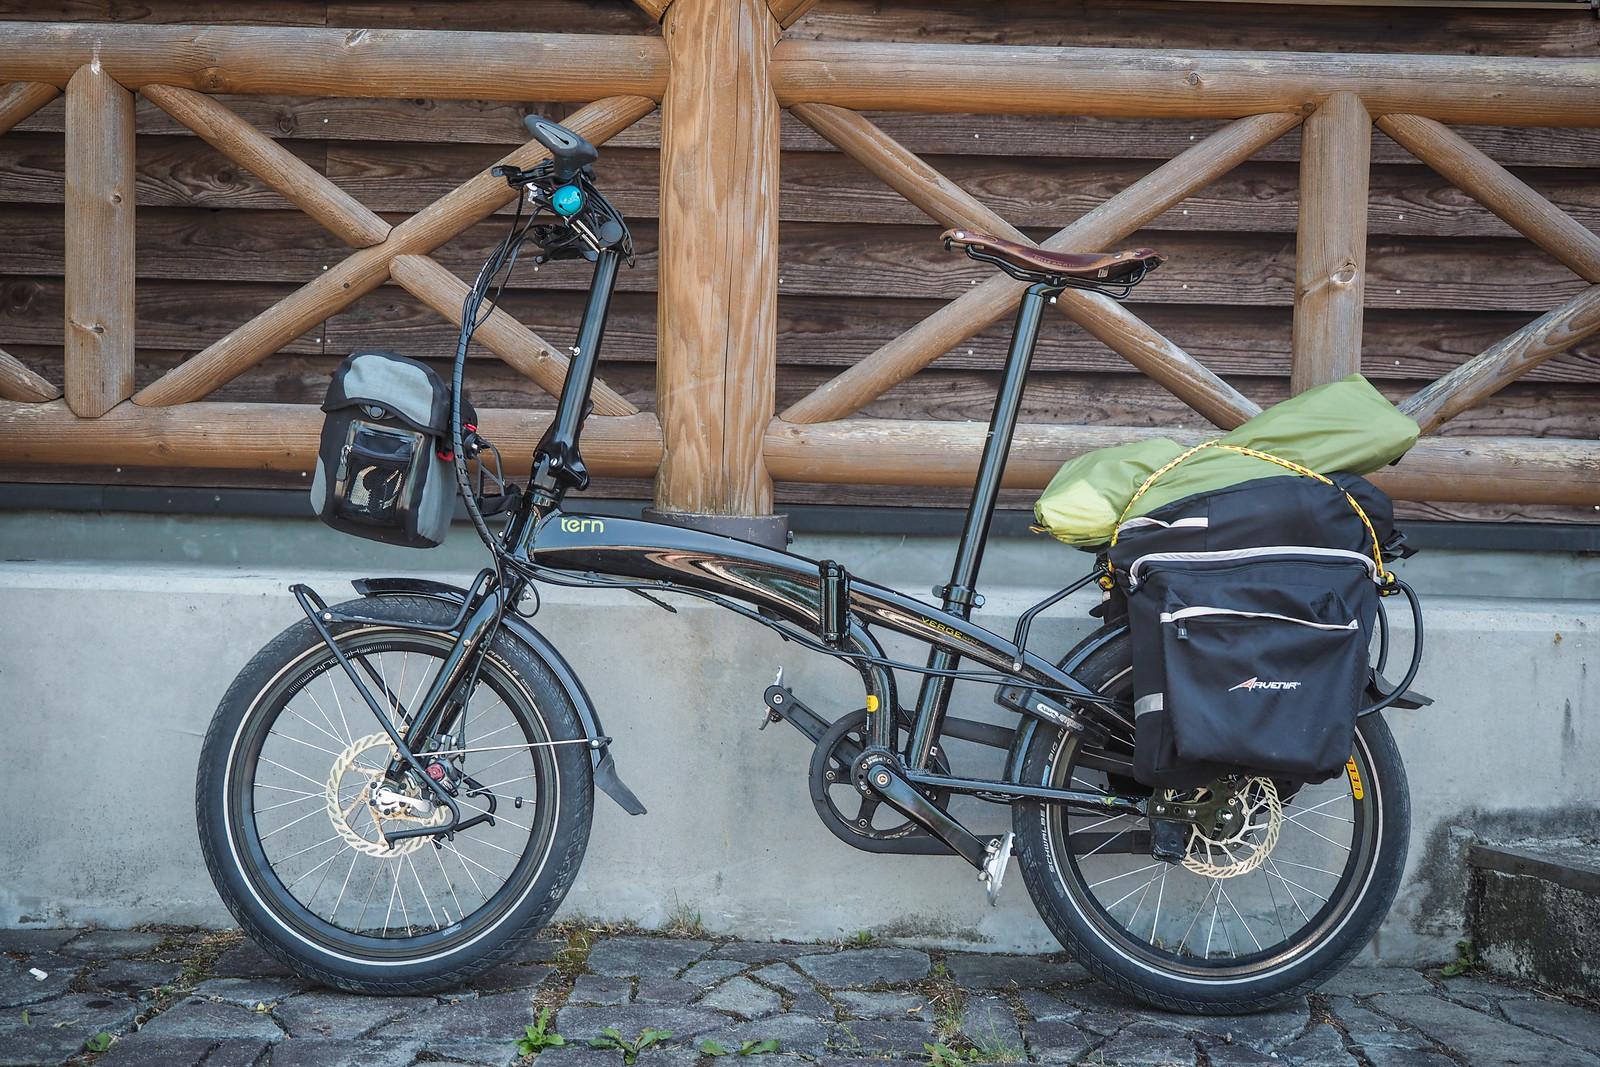 Tern Verge S27h folding touring bicycle (Chitose City, Japan)